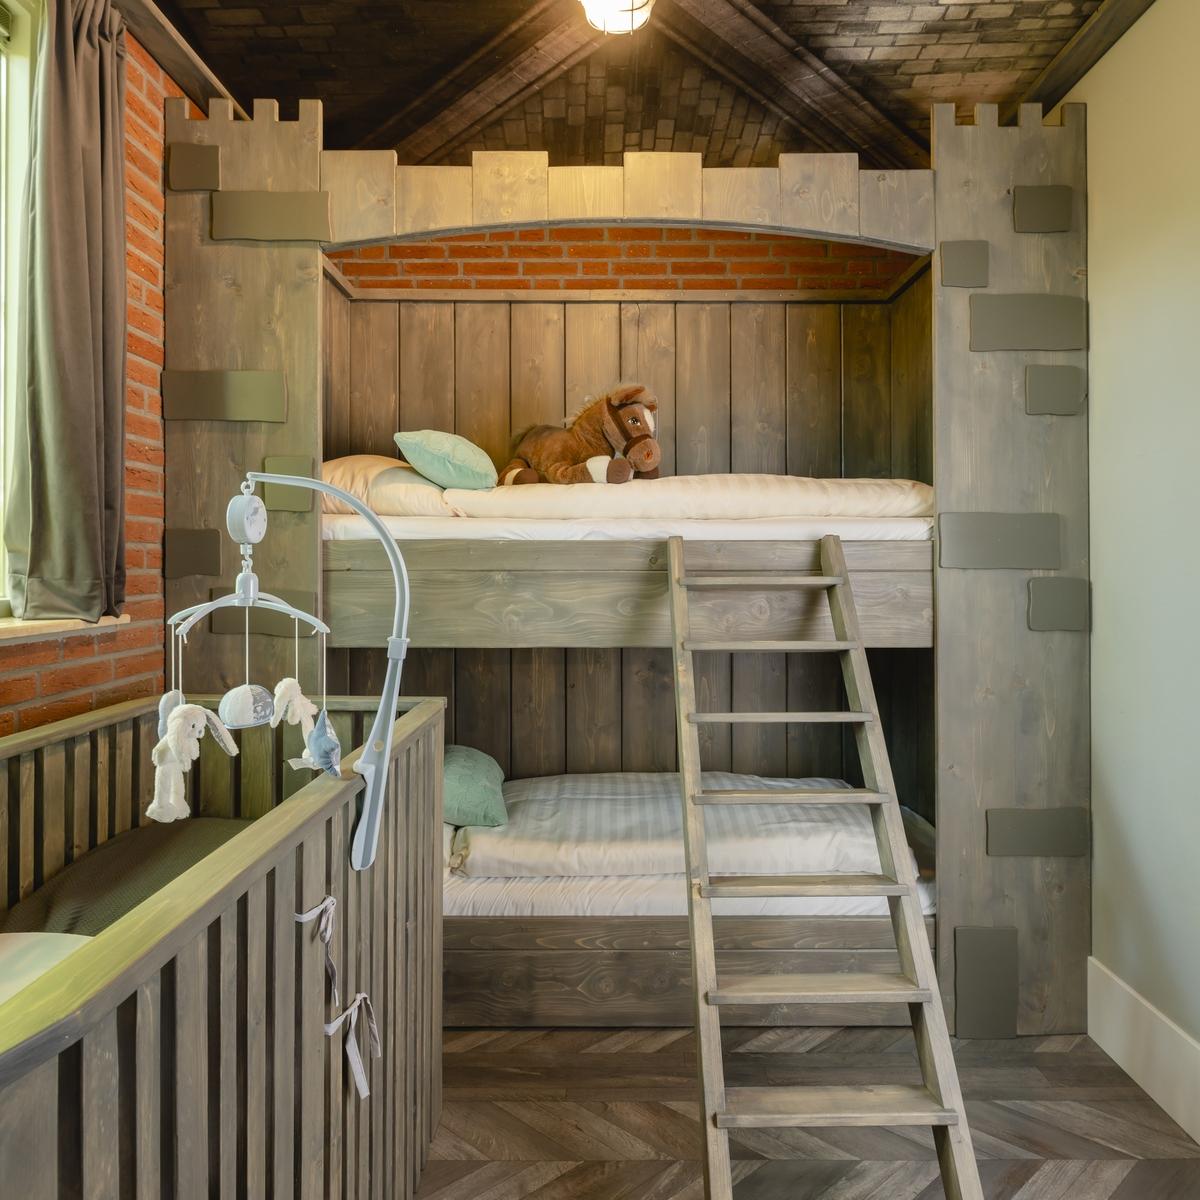 5-person baby & children's bungalow (copy)